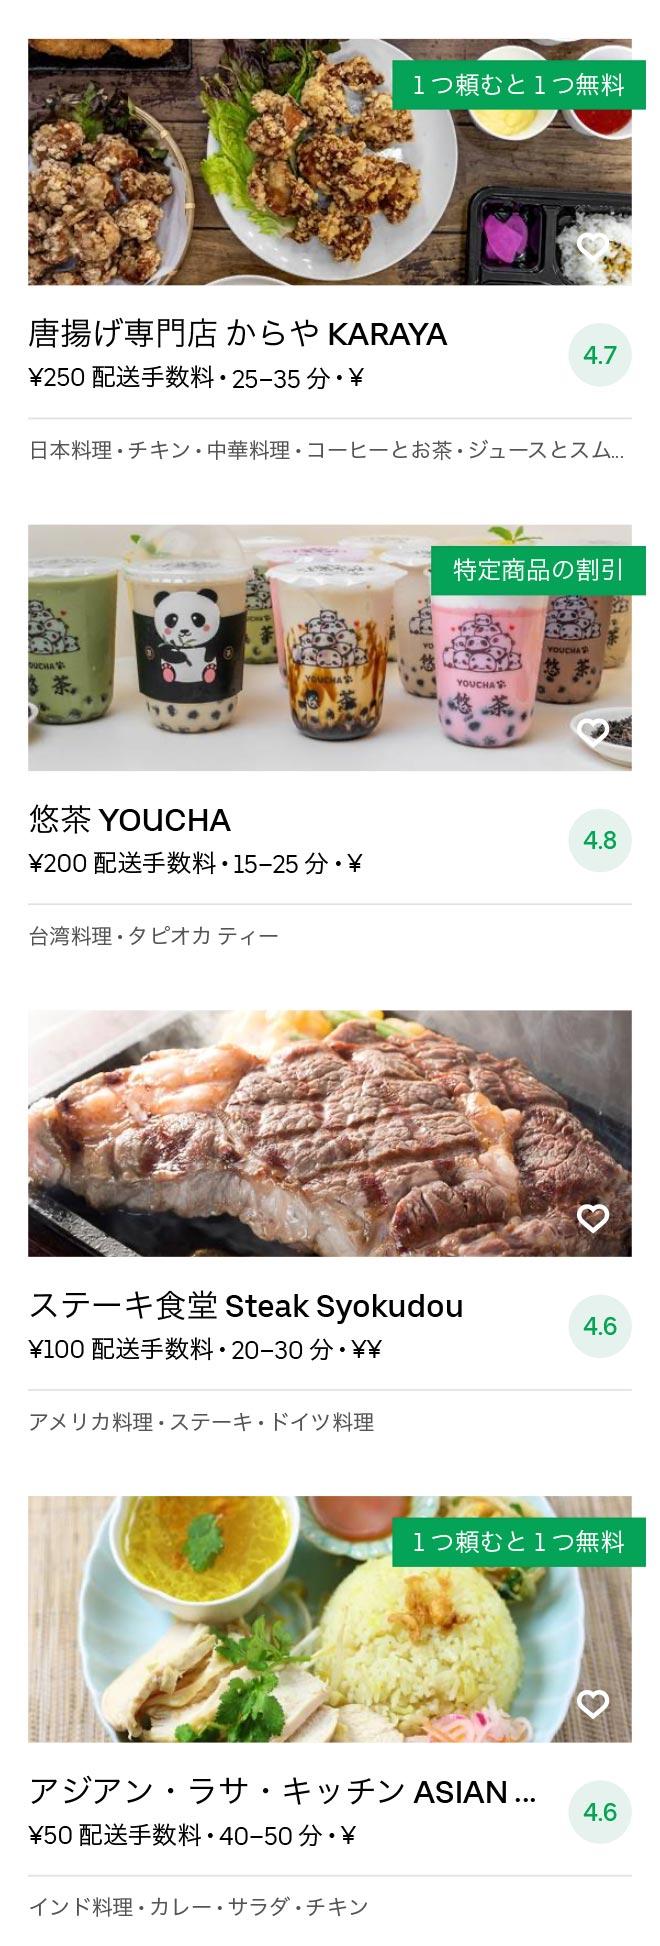 Matsuyama menu 2010 09